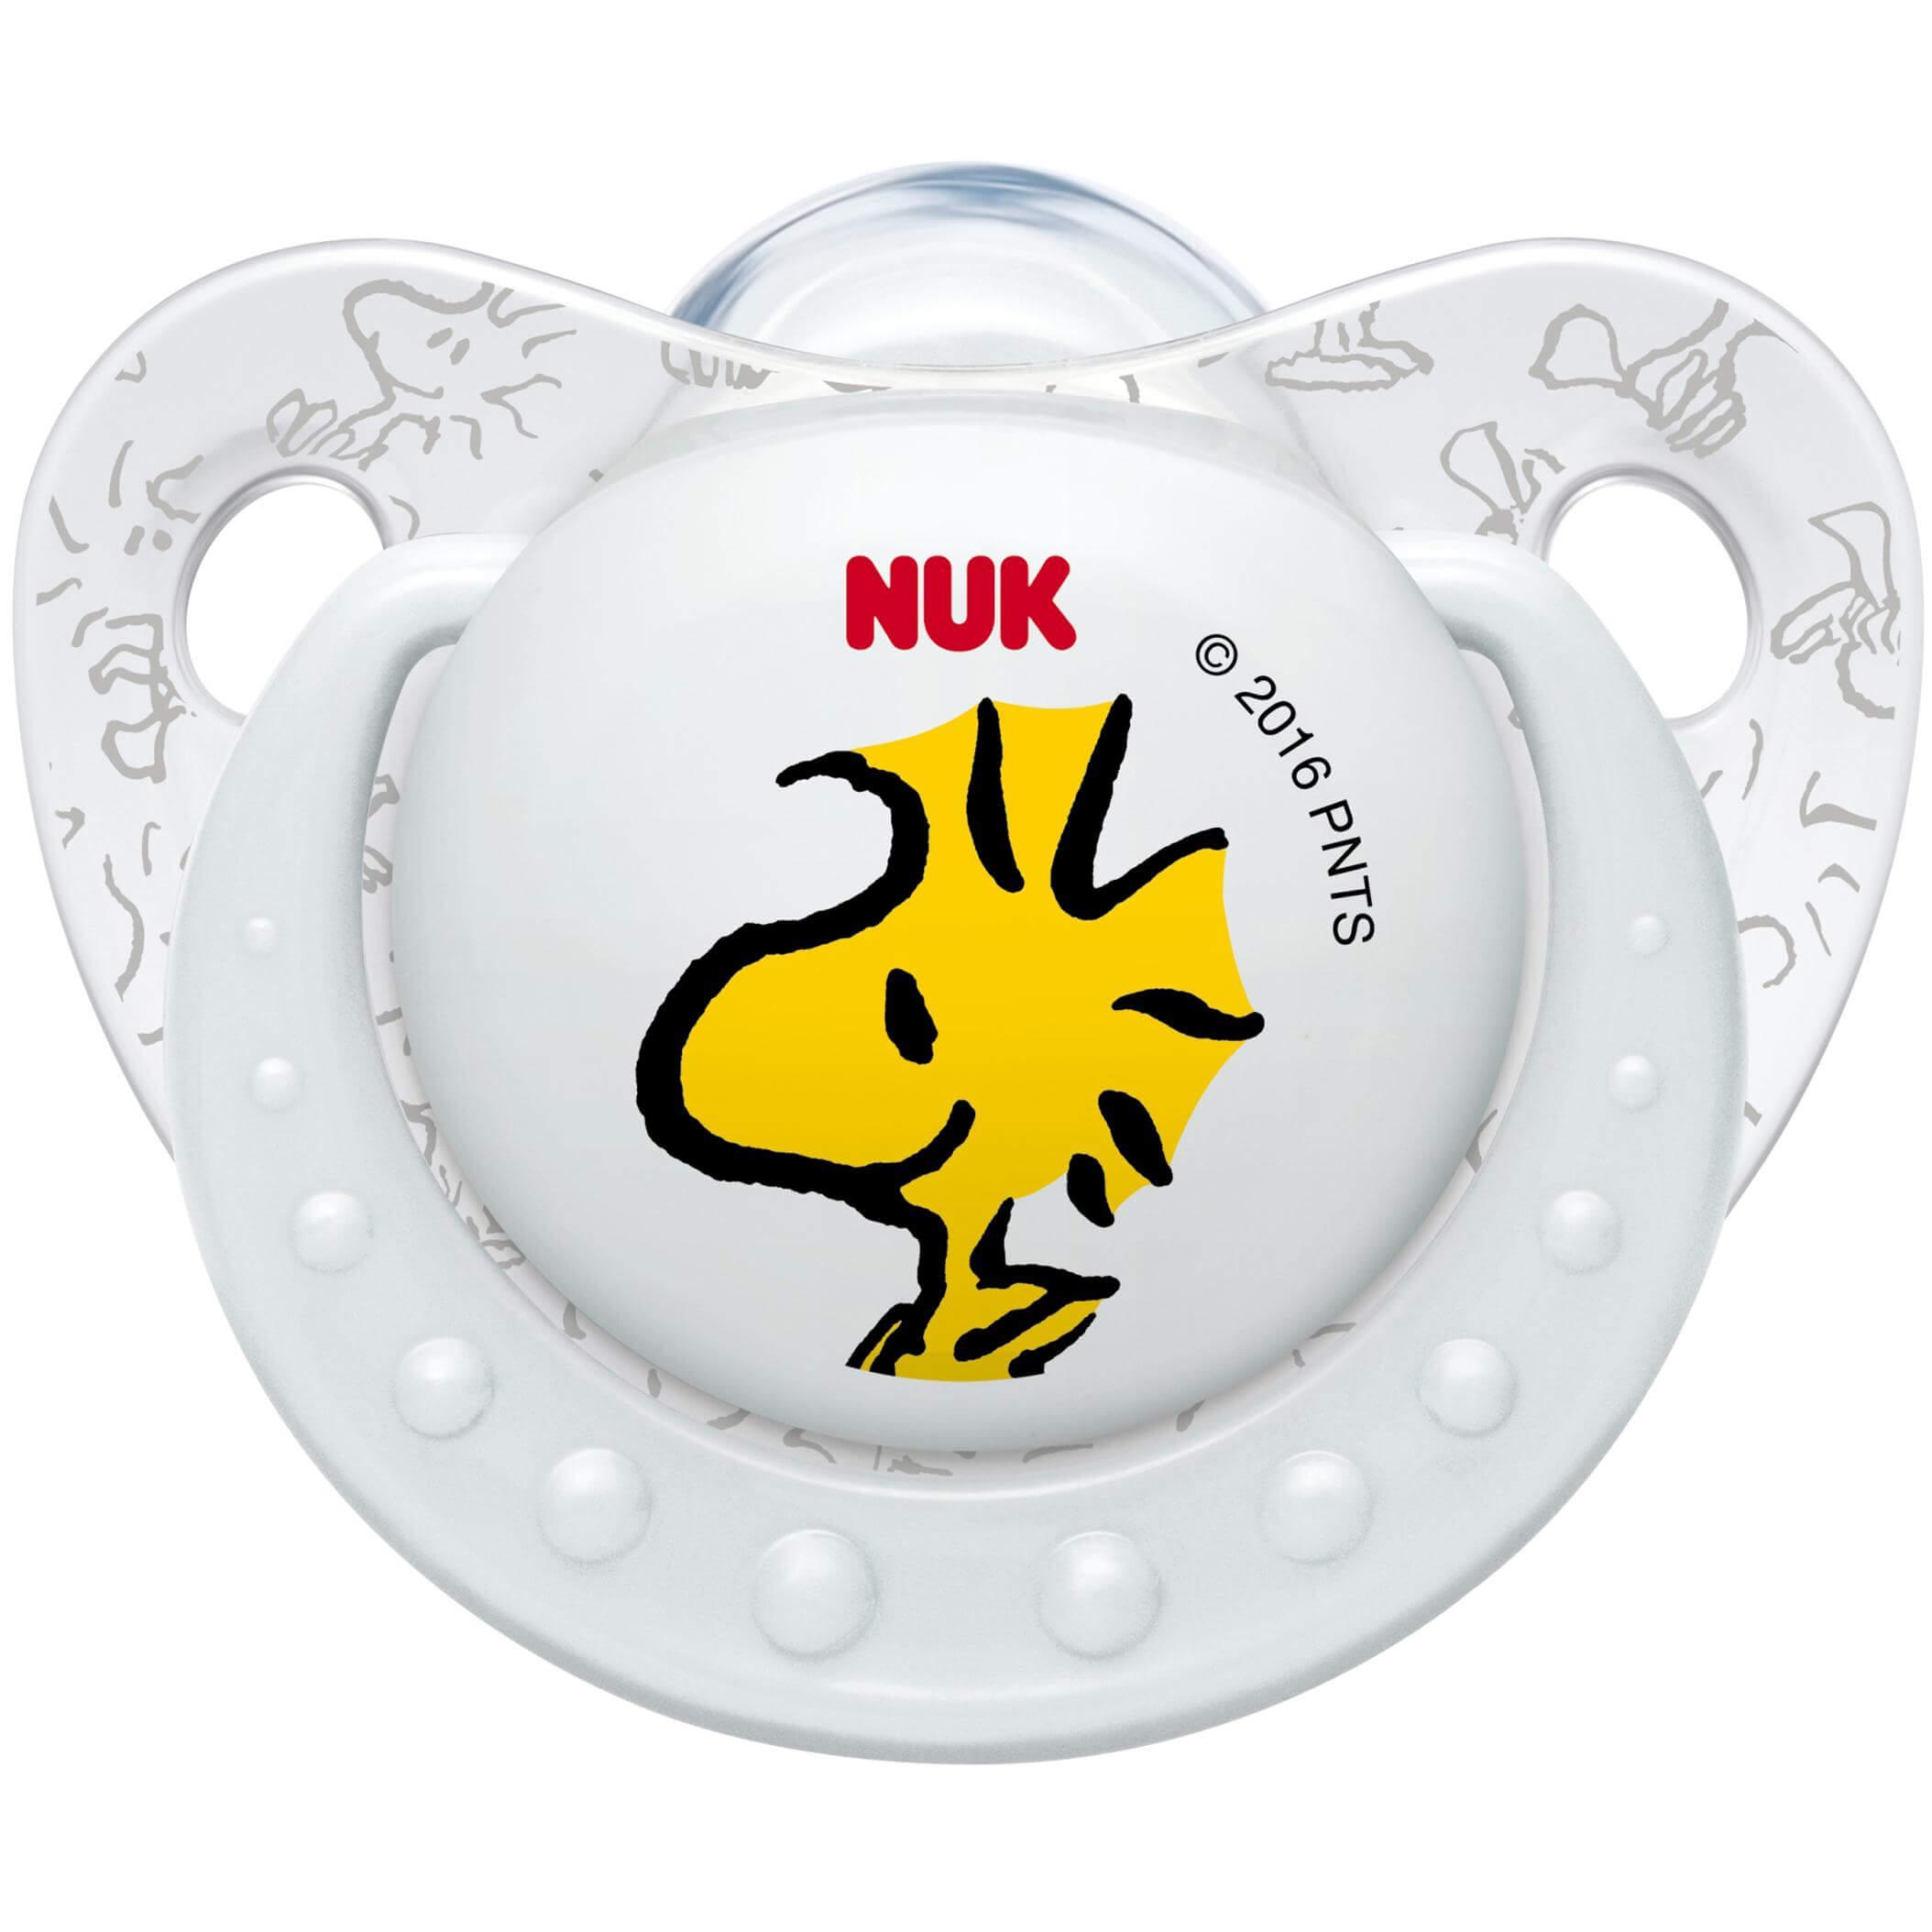 NukTrendline SnoopyPeanuts Πιπίλα Σιλικόνης με Κρίκο Χωρίς BPA Λευκό – Μέγεθος 3 (18-36 μηνών)